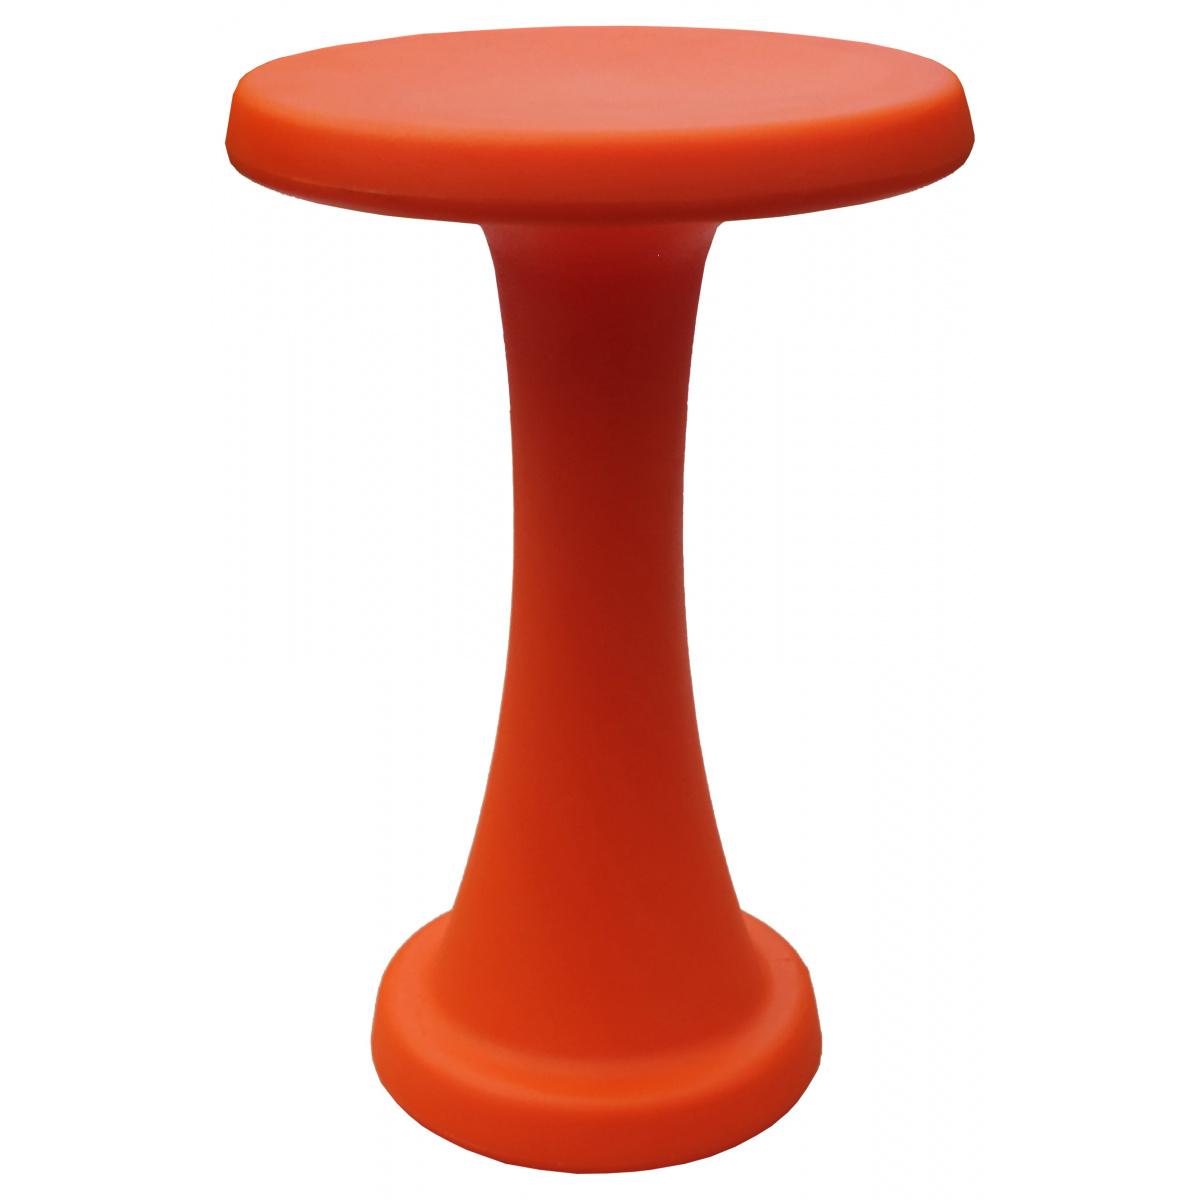 OneLeg 40 skammel - orange